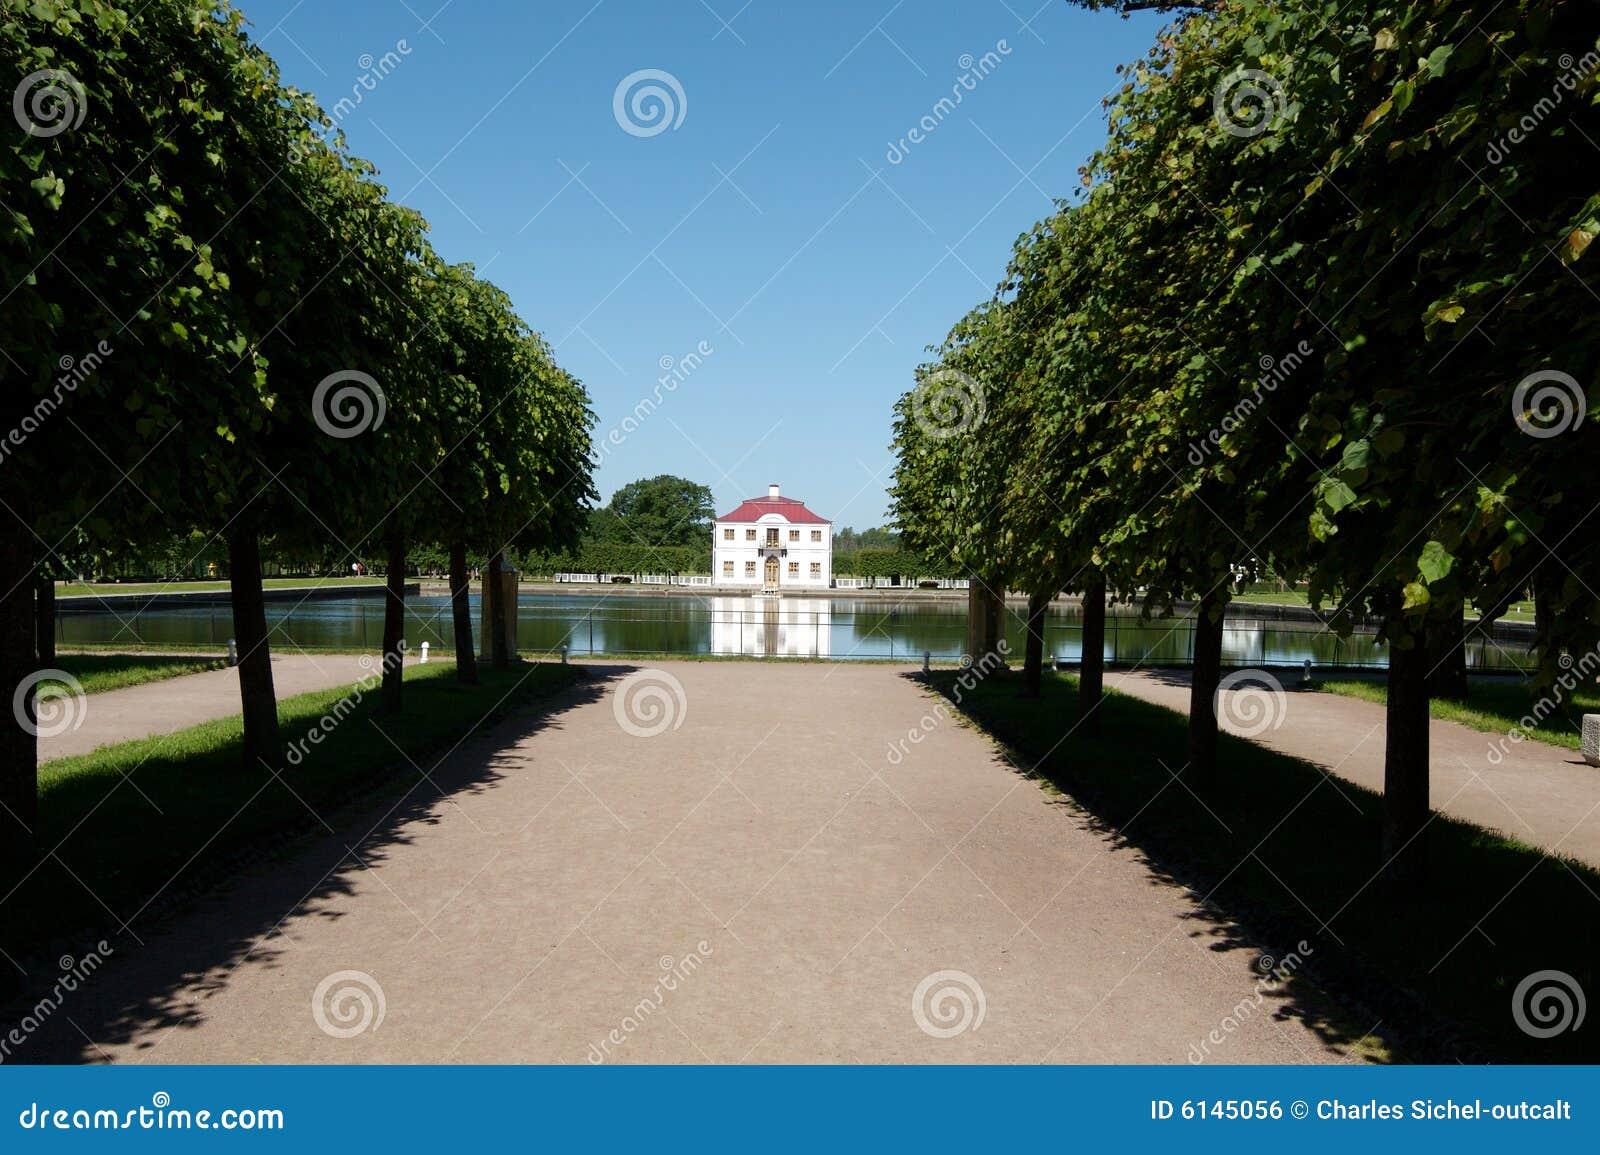 Peterhof palace in Russia